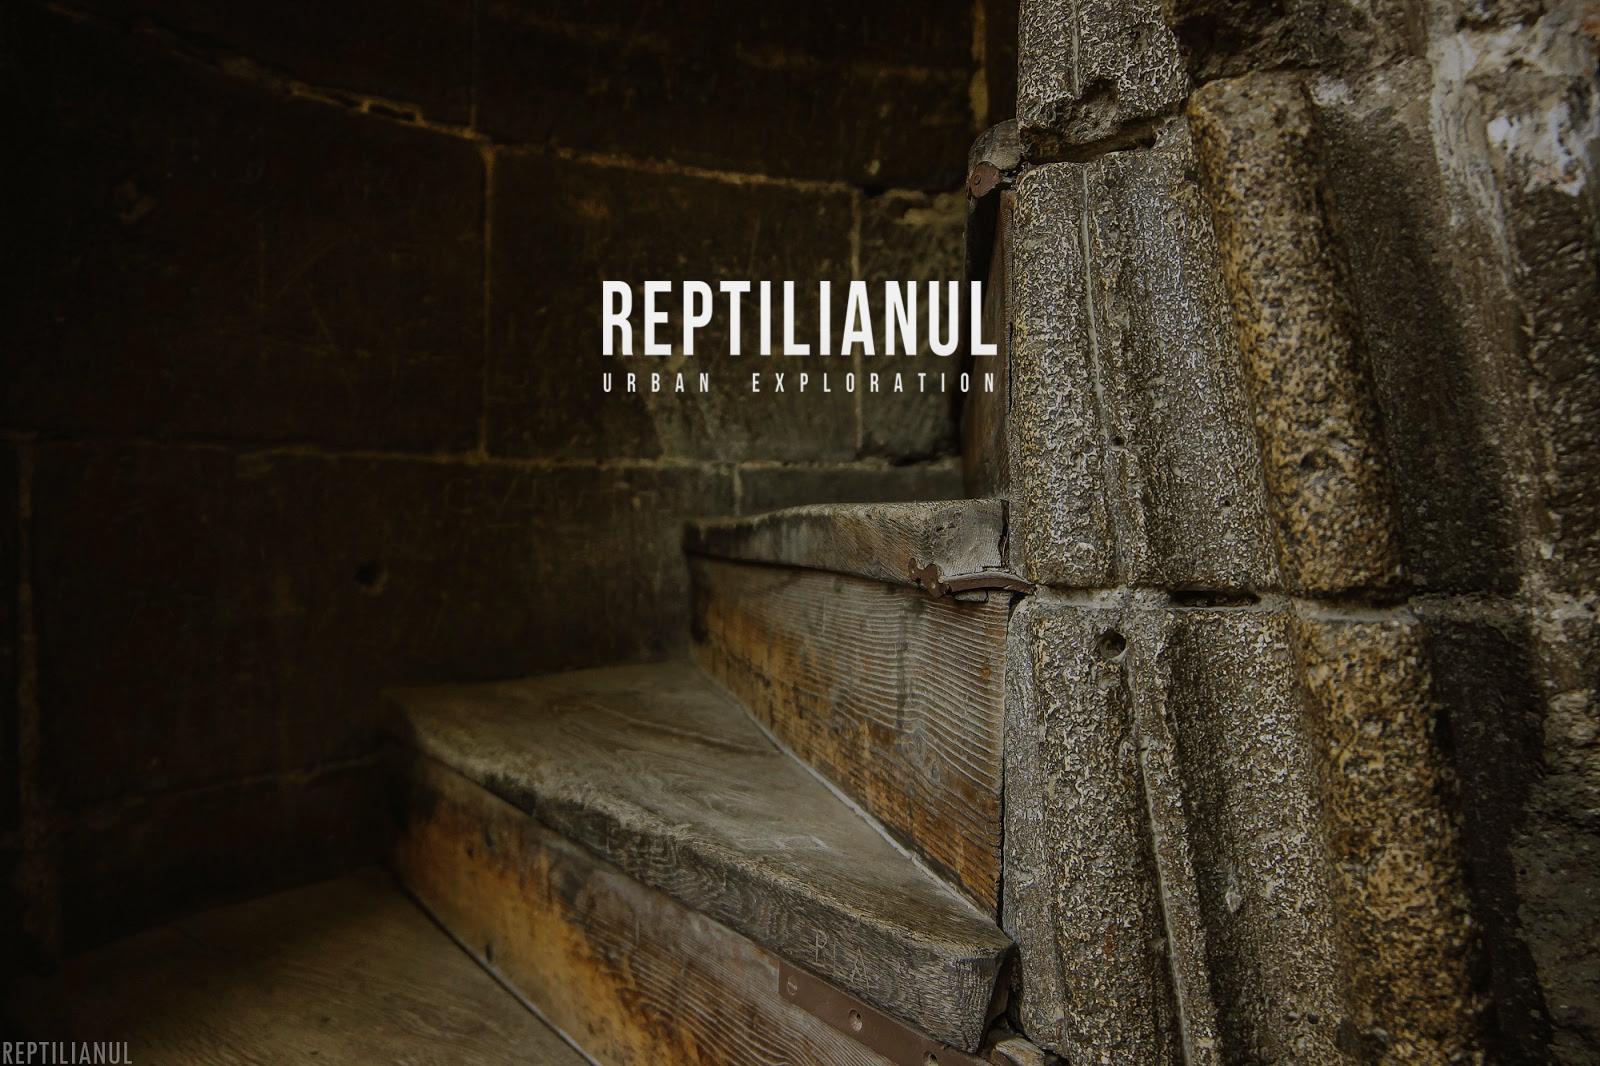 REPTILIANUL